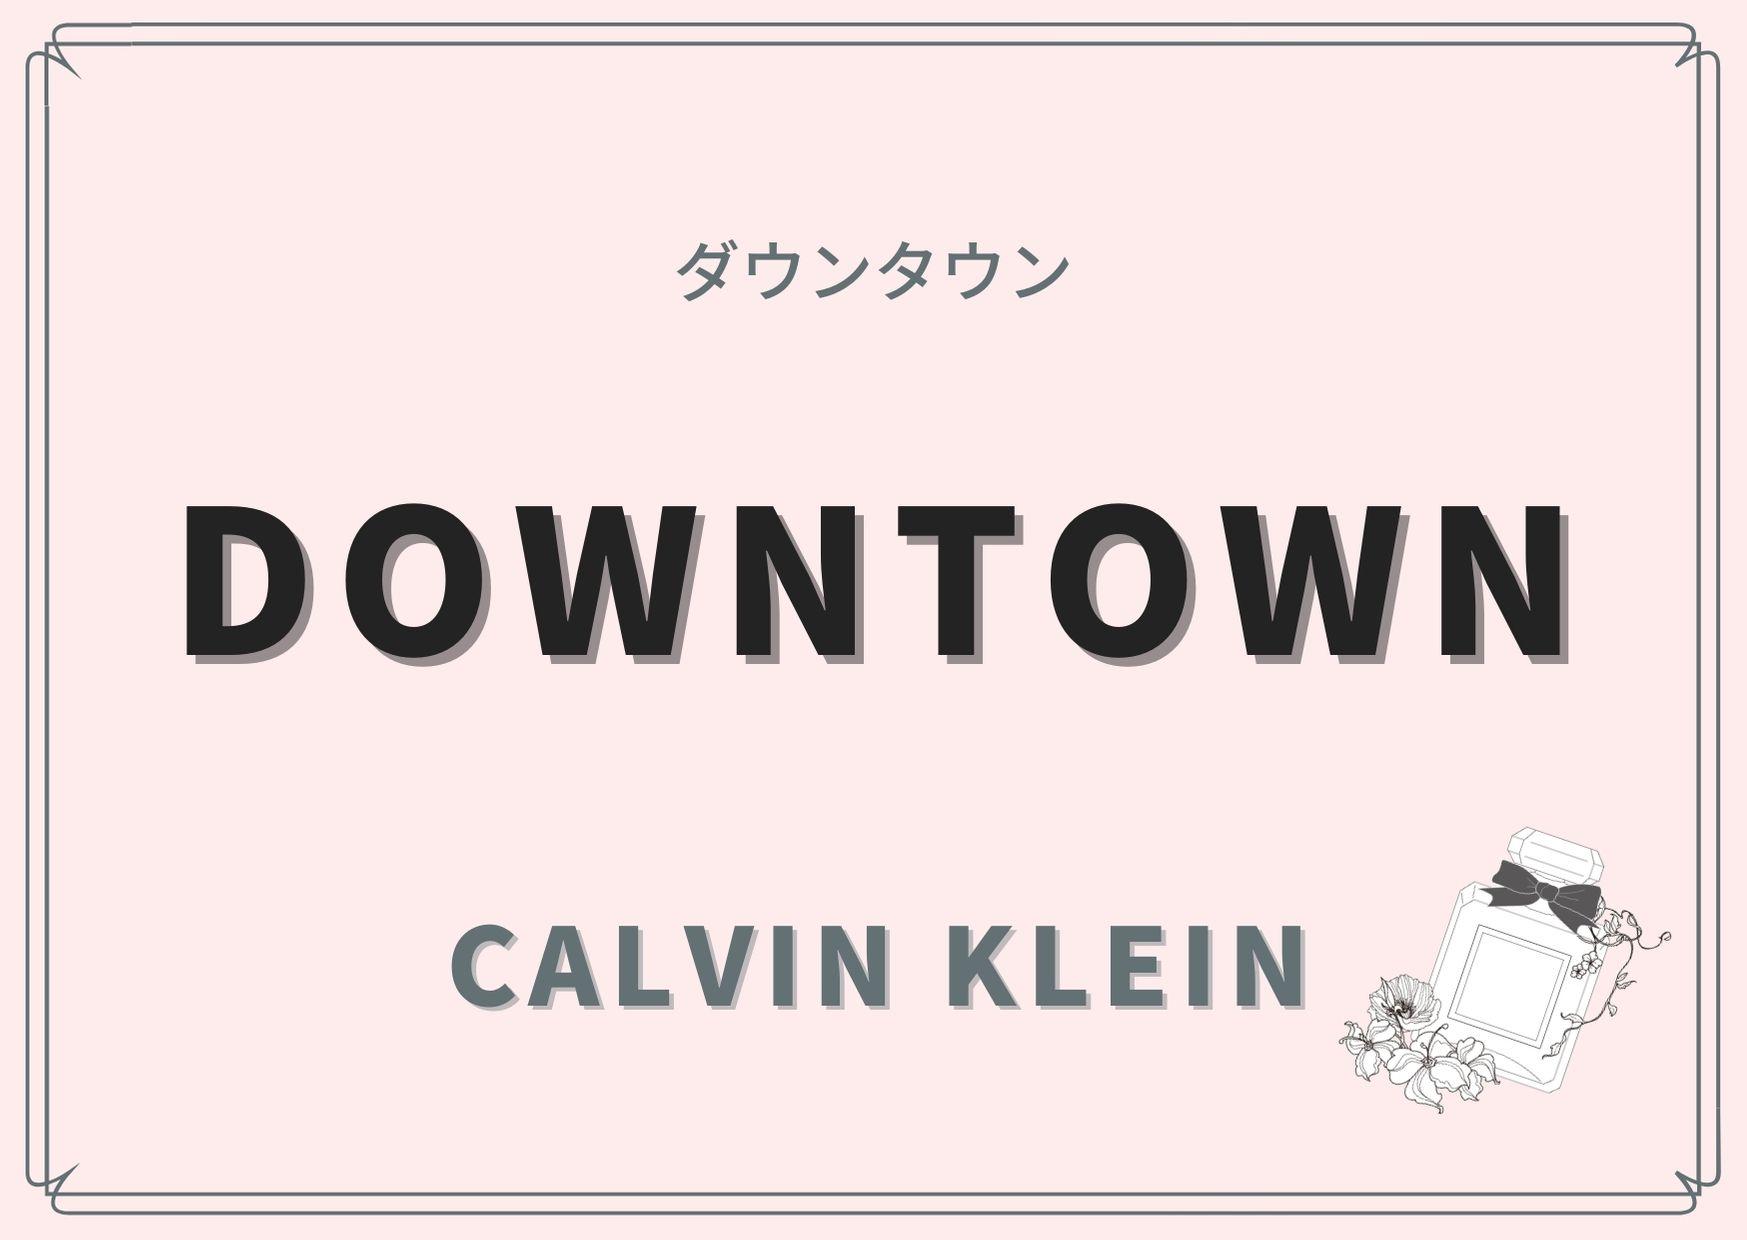 DOWNTOWN(ダウンタウン)/Calvin Klein(カルバン クライン)